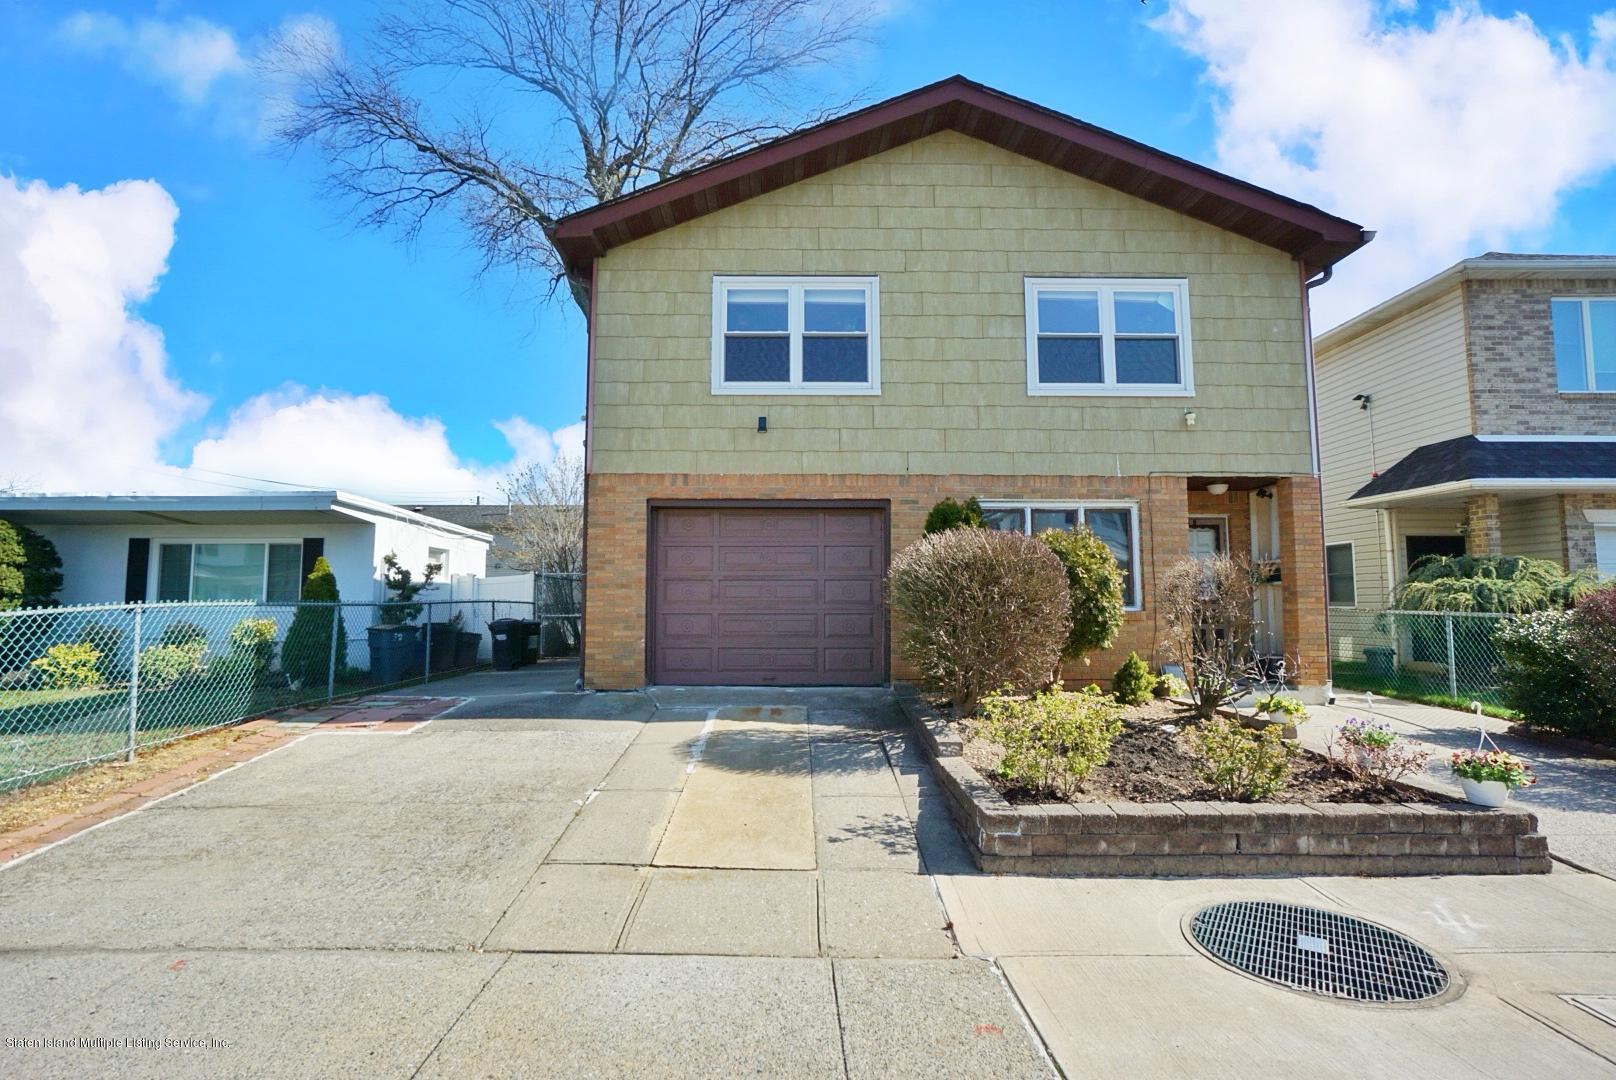 Single Family - Detached 495 Winchester Avenue  Staten Island, NY 10312, MLS-1136561-3